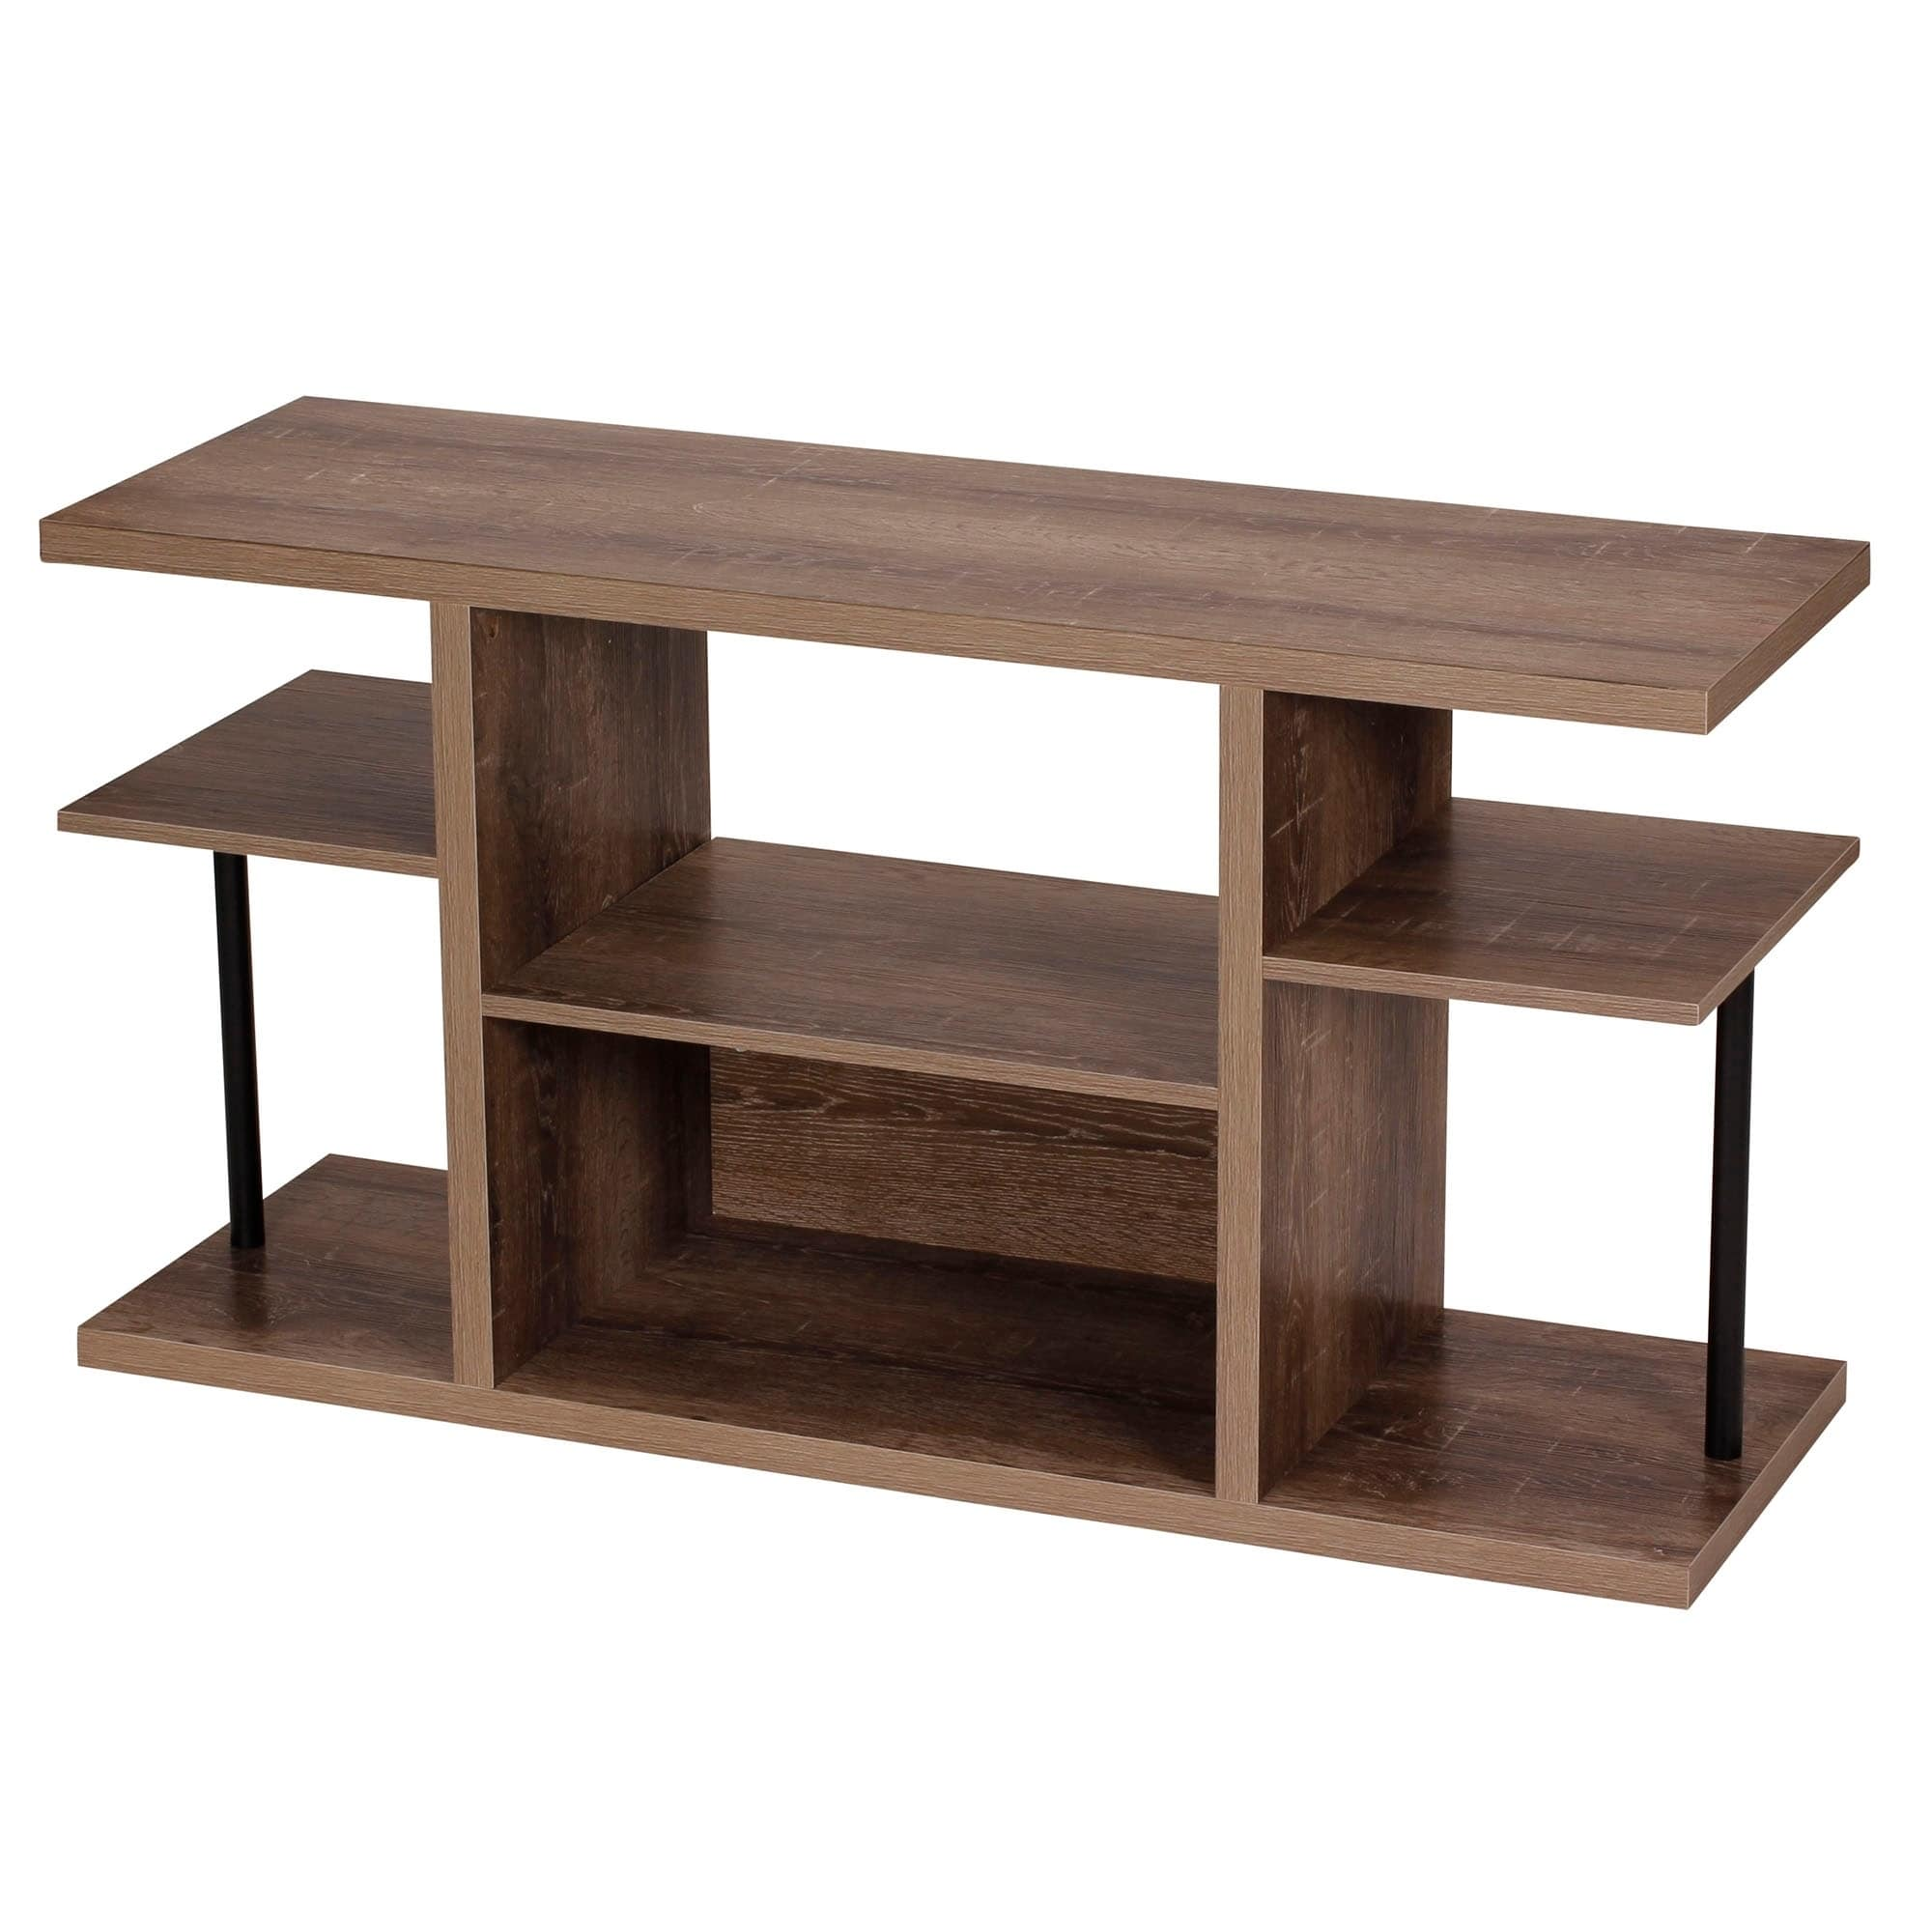 Household Essentials Ashwood Media Center 6-Shelf Storage Console